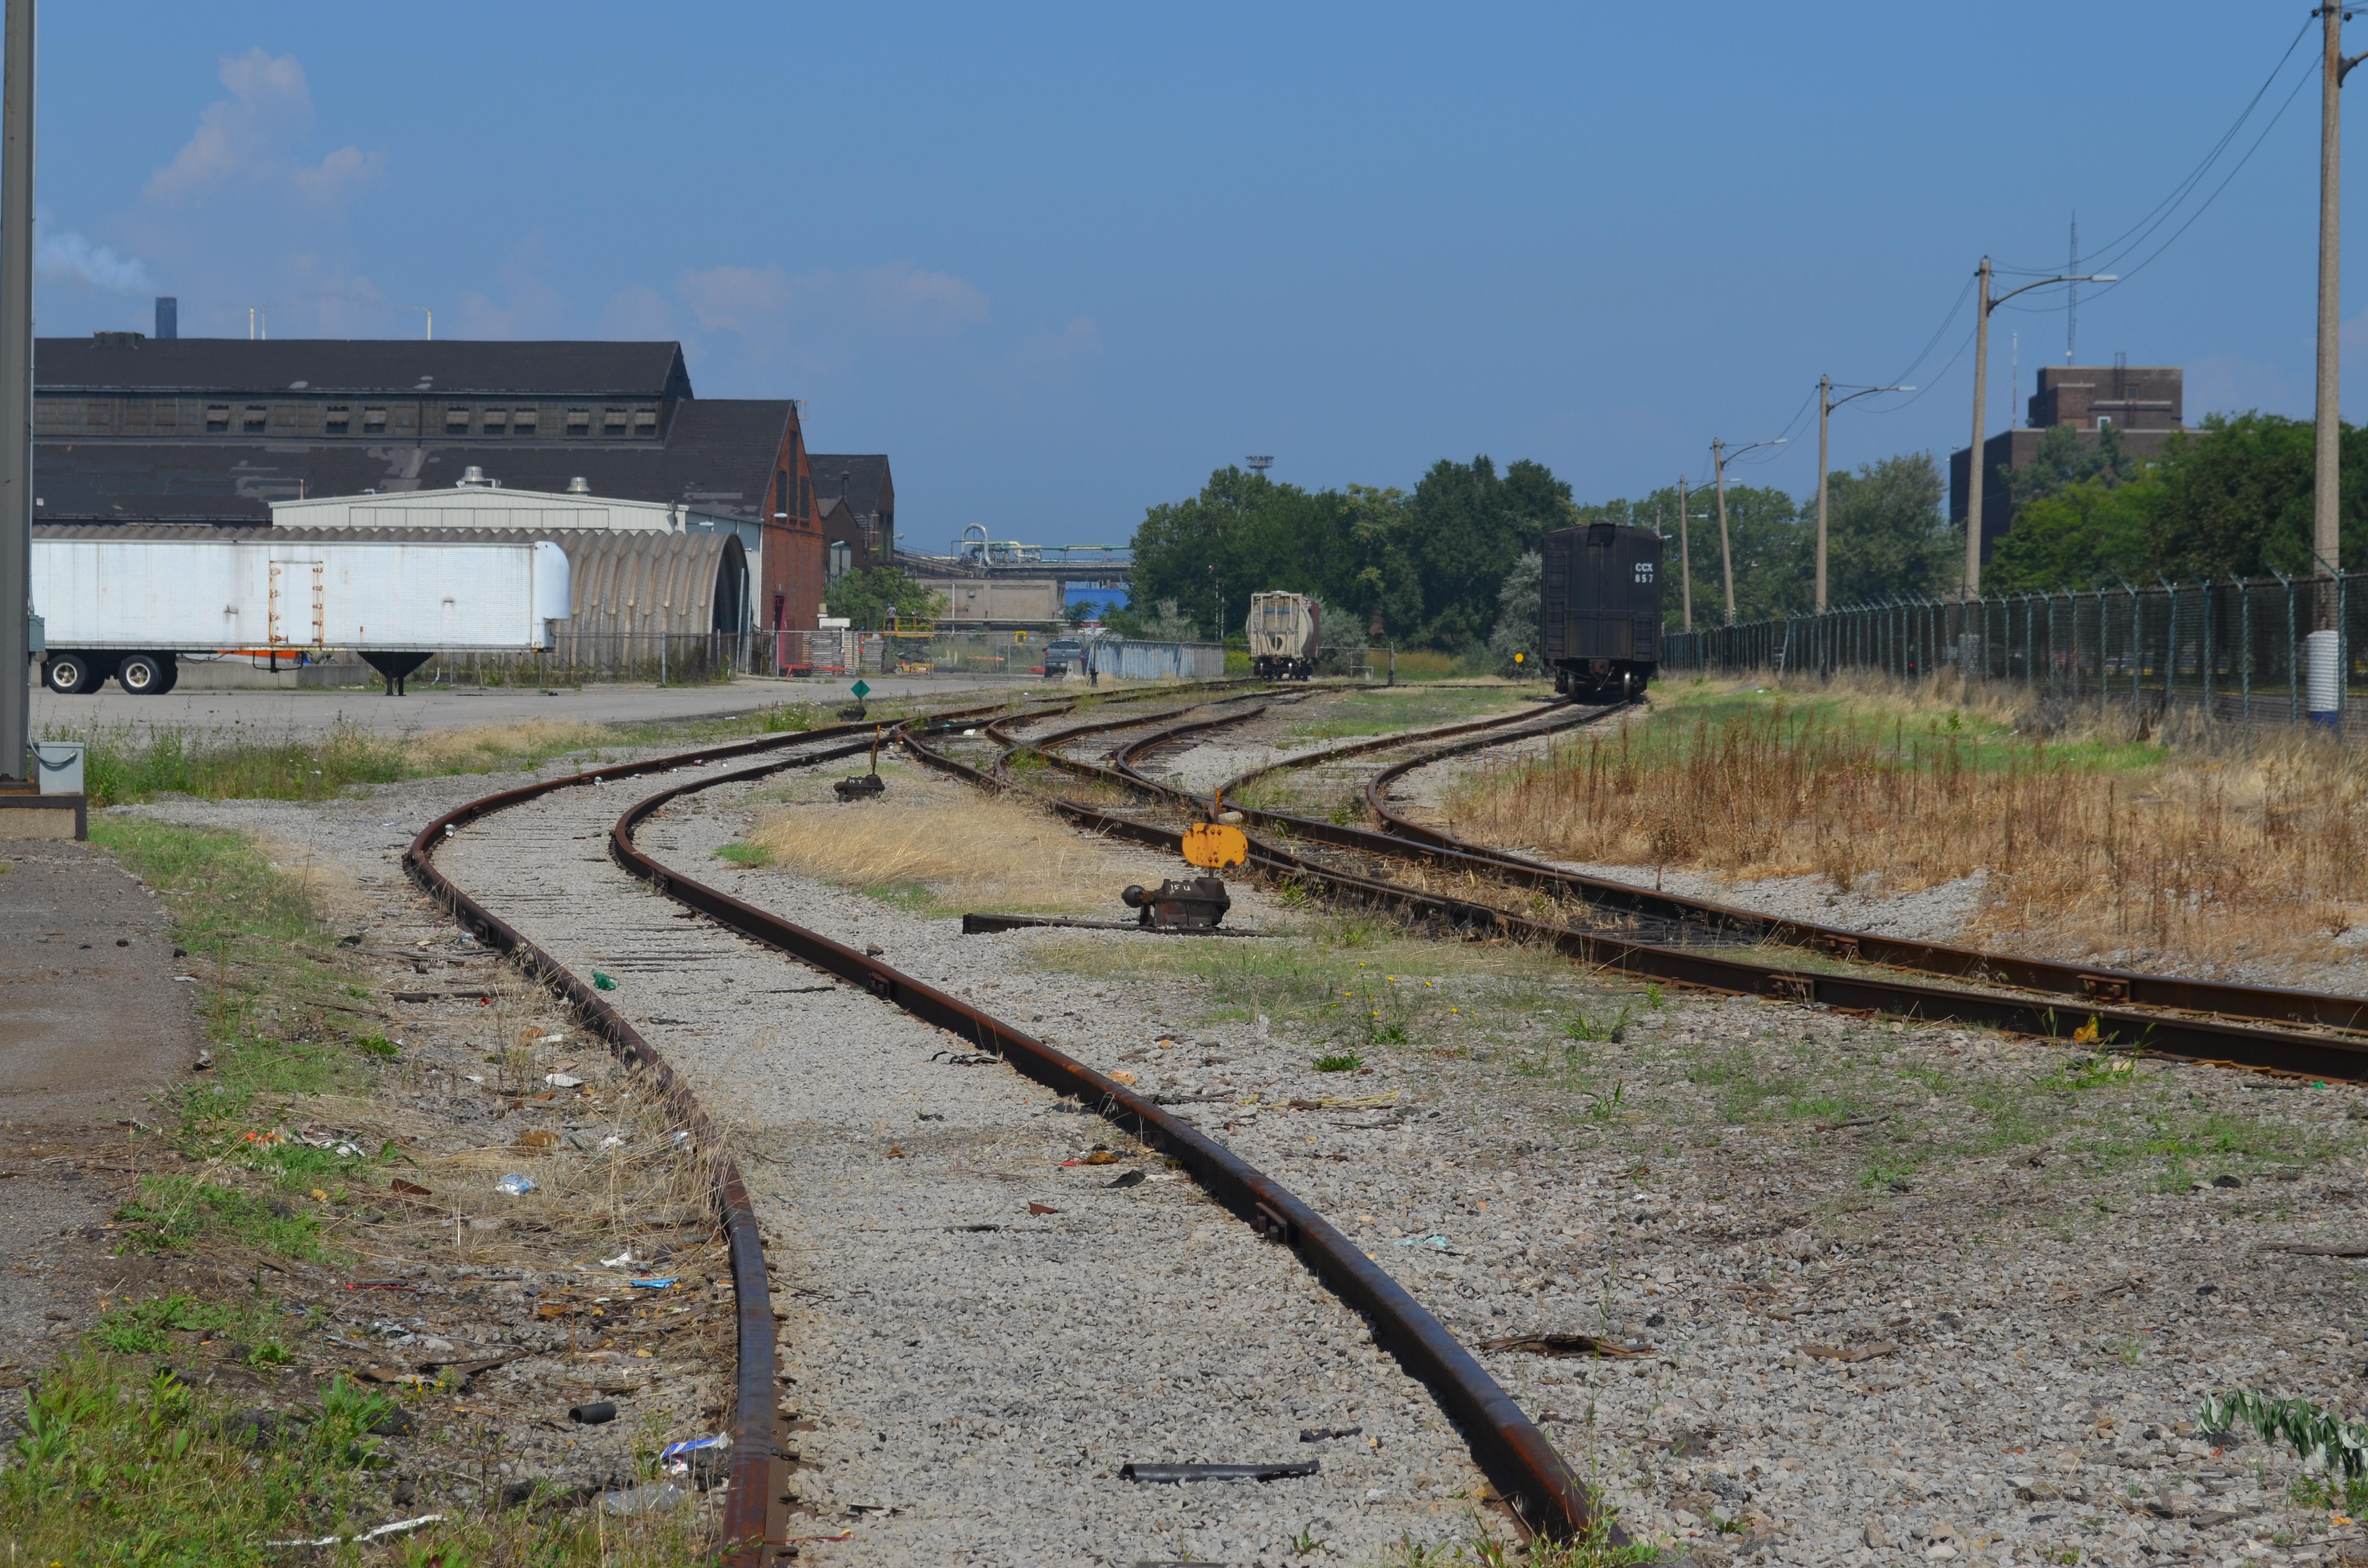 film_location_railtracks2